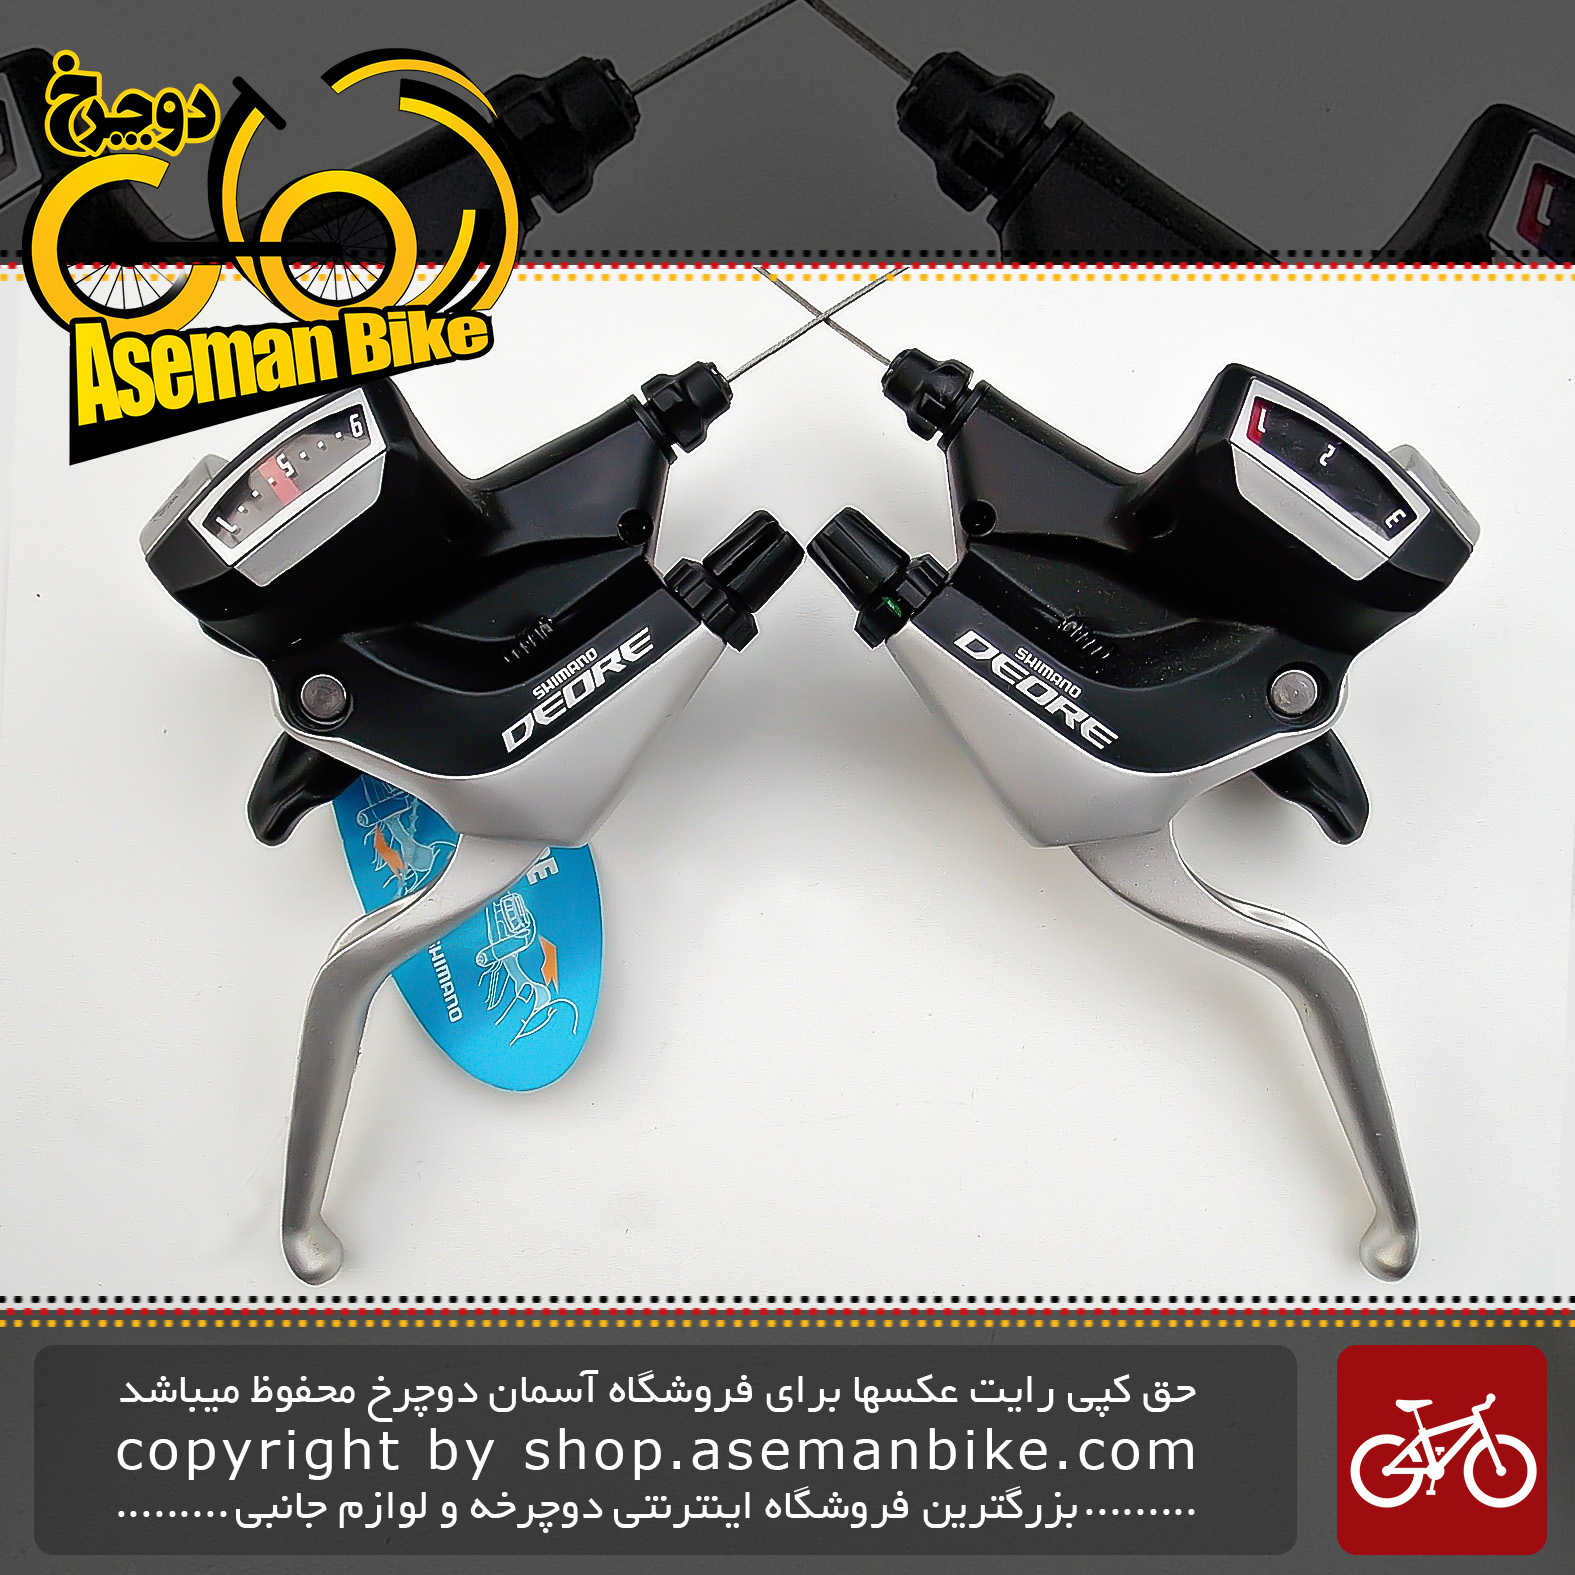 دسته دنده و دسته ترمز یکپارچه شیمانو مدل دیور ام 590 3 در 9 سرعته ساخت ژاپن Shimano Shifter And Brake Lever Bicycle Deore ST-M590 3×9 Speed Japan